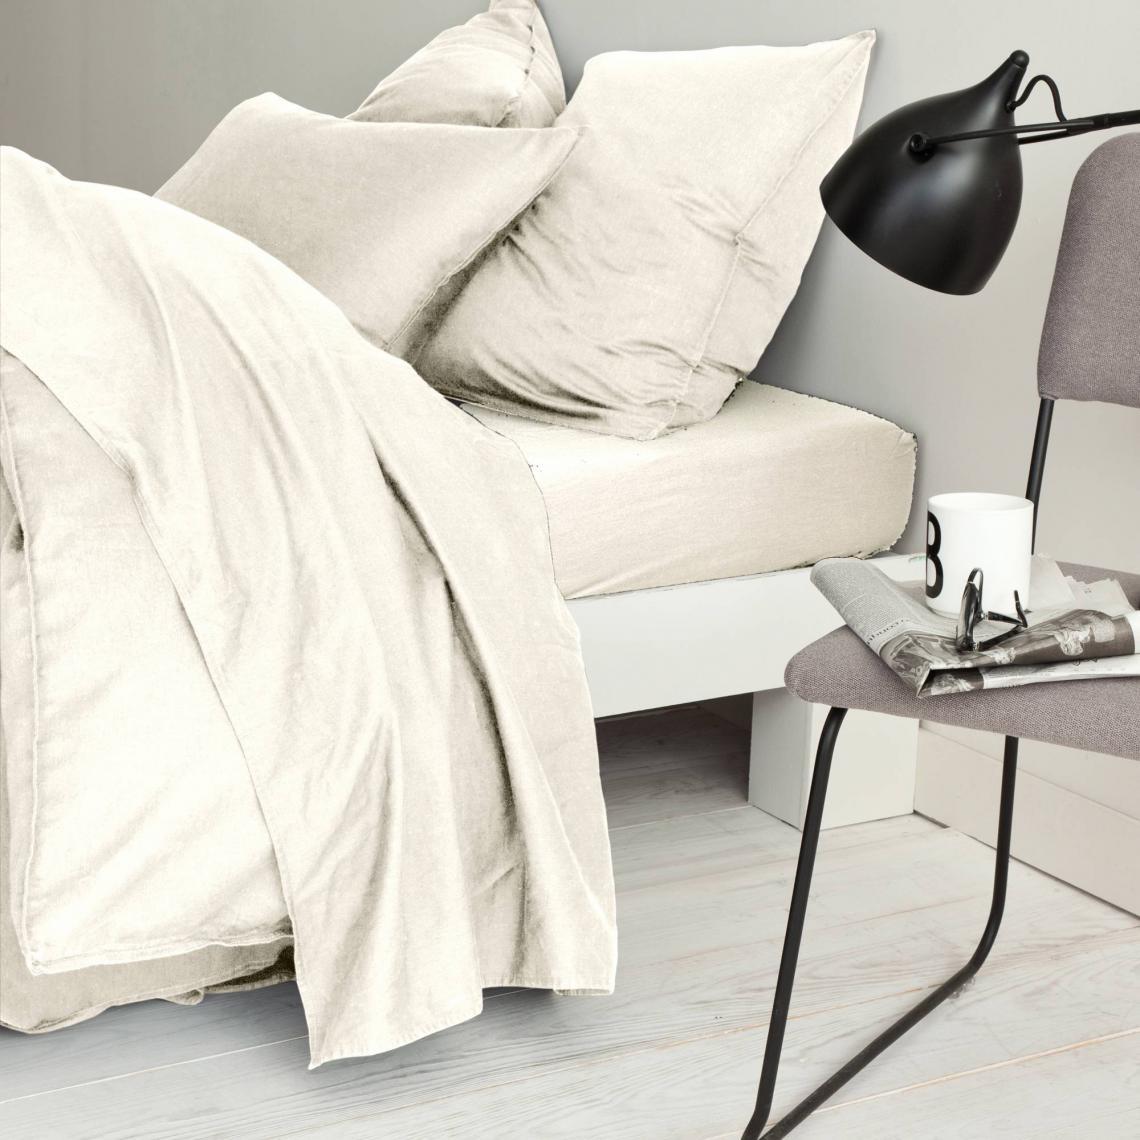 fil harmony linge de maison ventana blog. Black Bedroom Furniture Sets. Home Design Ideas